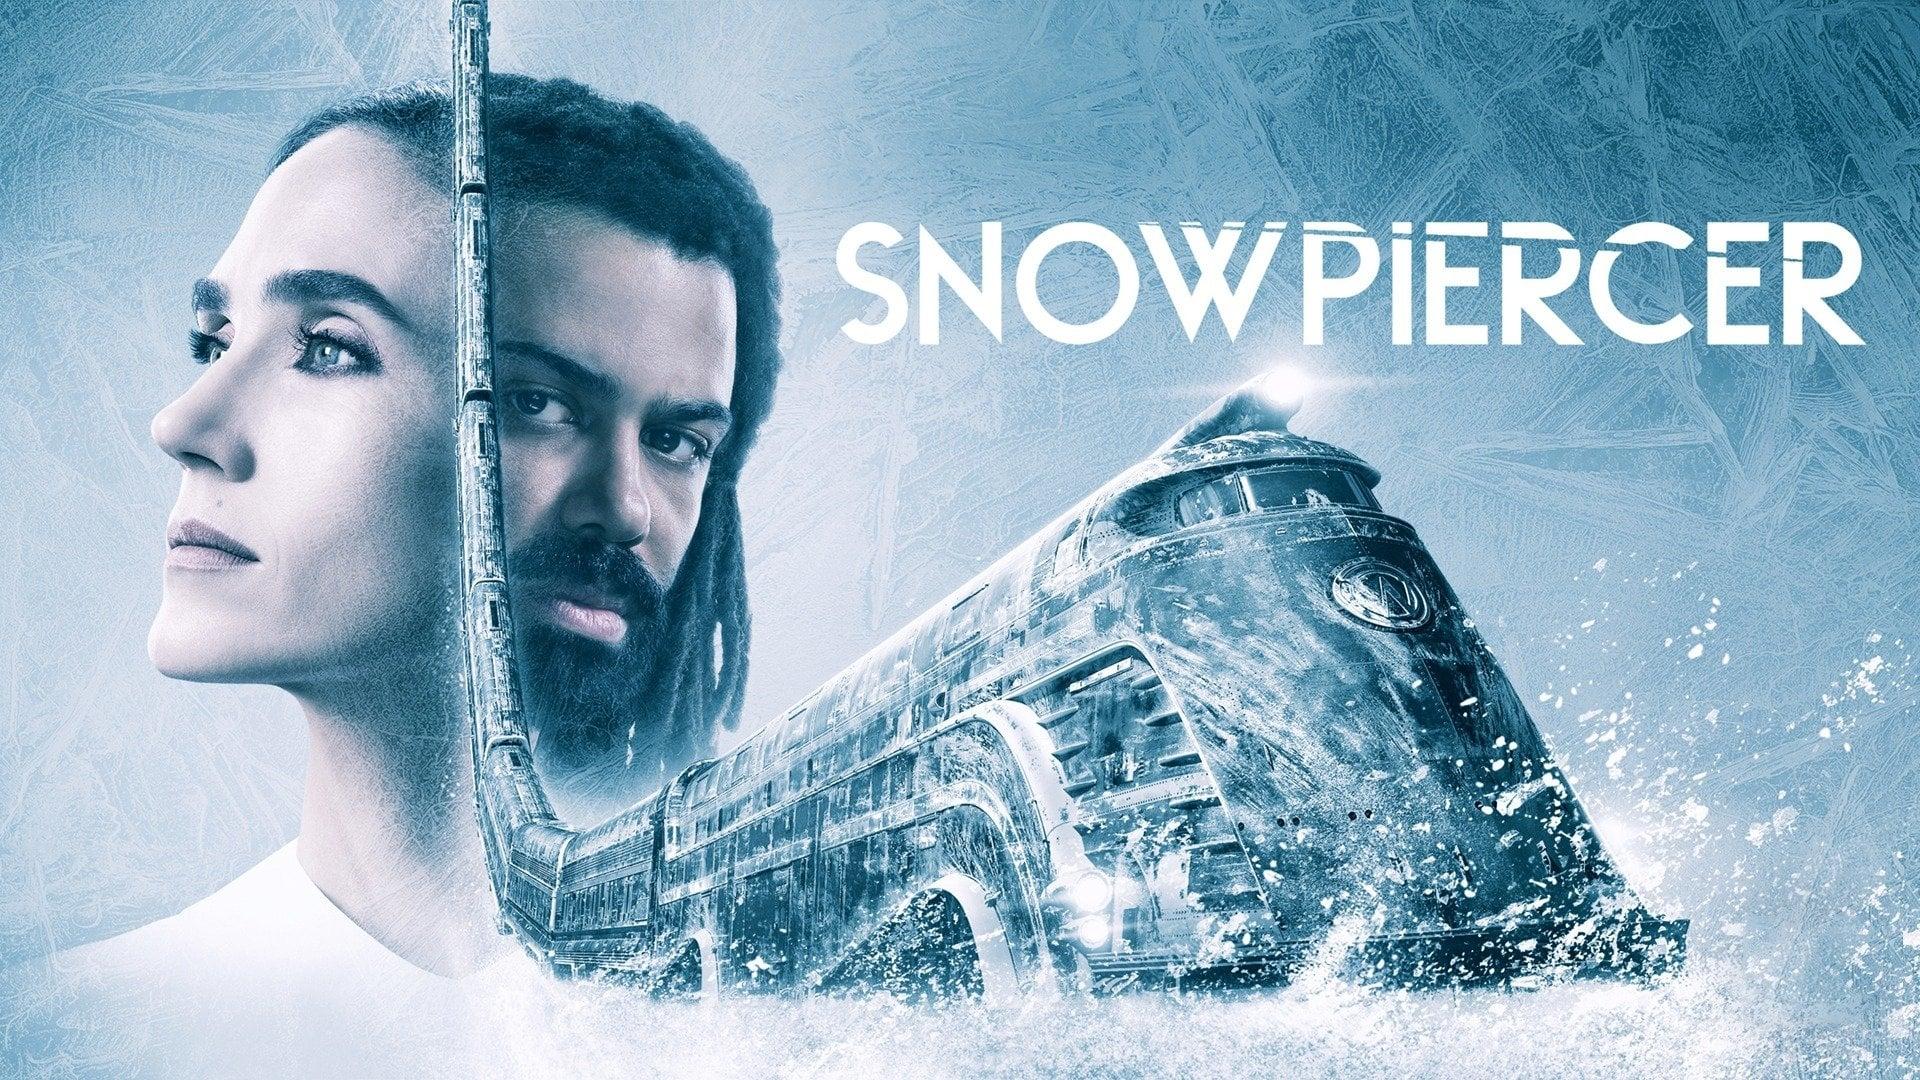 Snowpiercer Season 2 Episode 4